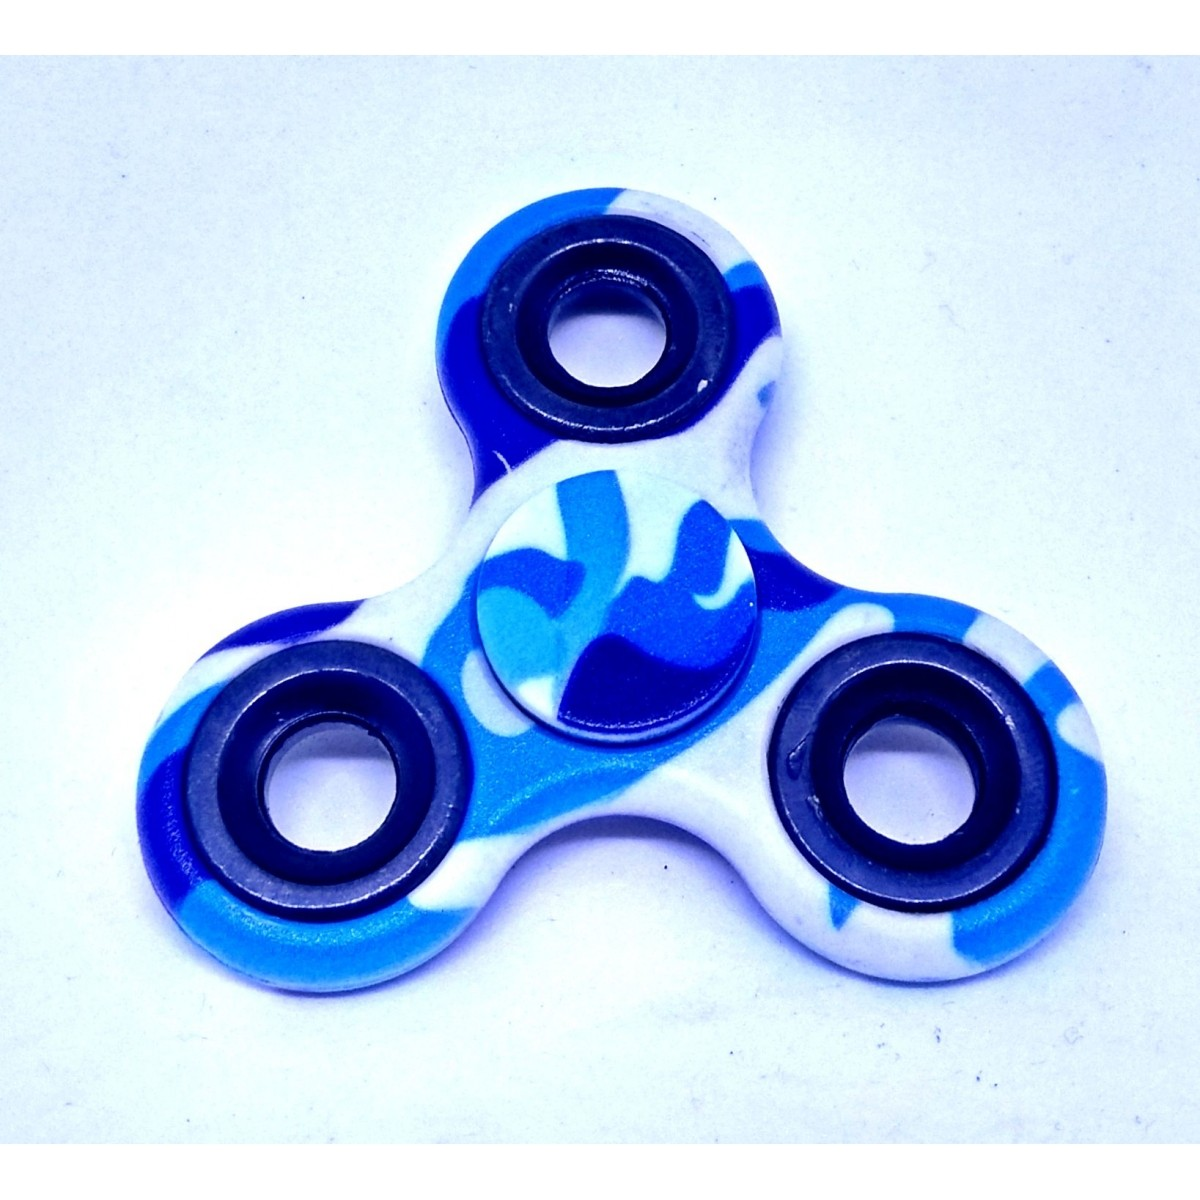 Hand Spinner Azul e Branco - Rolamento Anti Estresse Fidget Hand Spinner